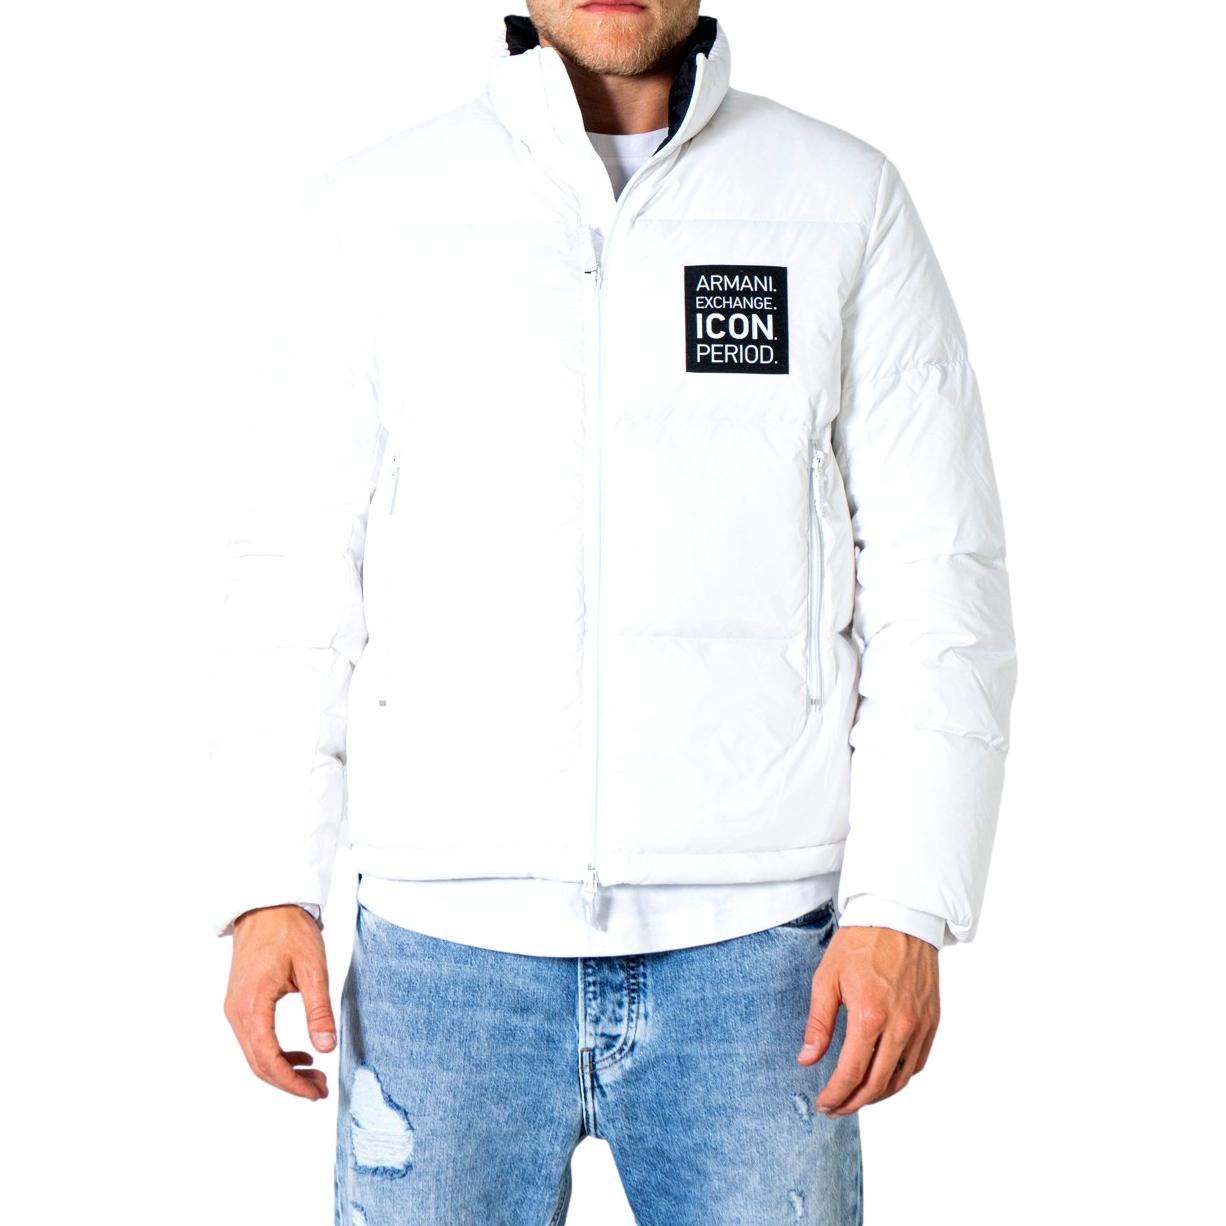 Down-filled puff jacket with Icon period logo ARMANI EXCHANGE |  | 8NZBP2 ZNYNZ1100